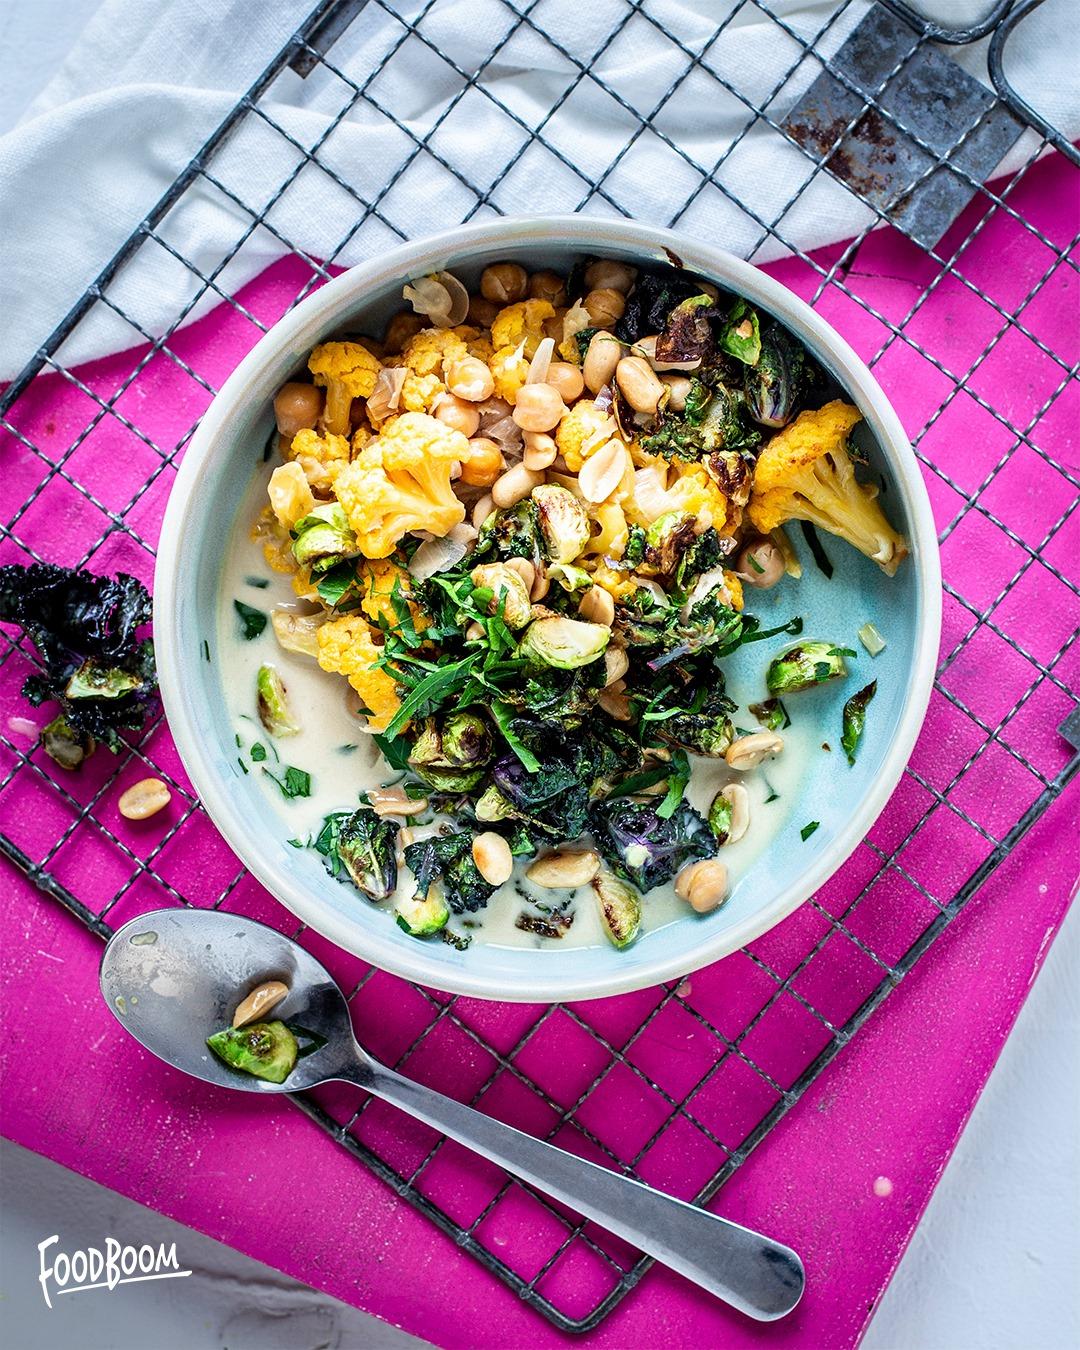 Zu faul zum kochen? Foodboom inspiriert dich zu deinem Homeoffice Lunch.